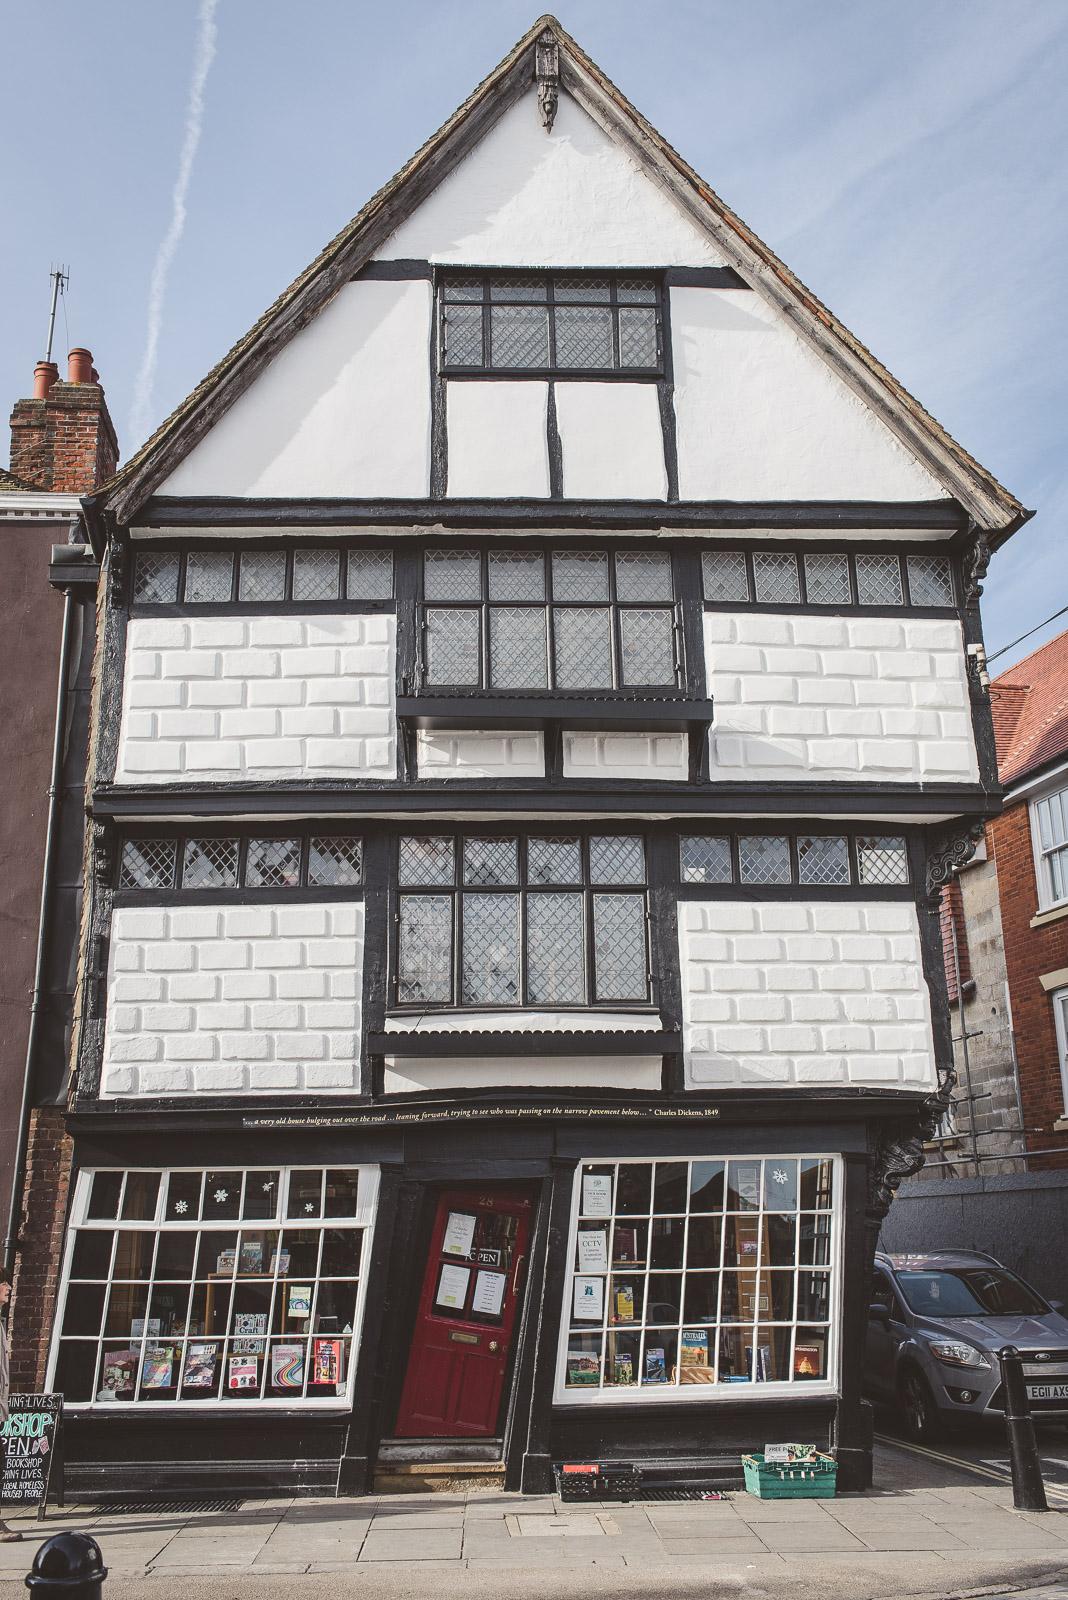 Canterbury bookshop, Kent